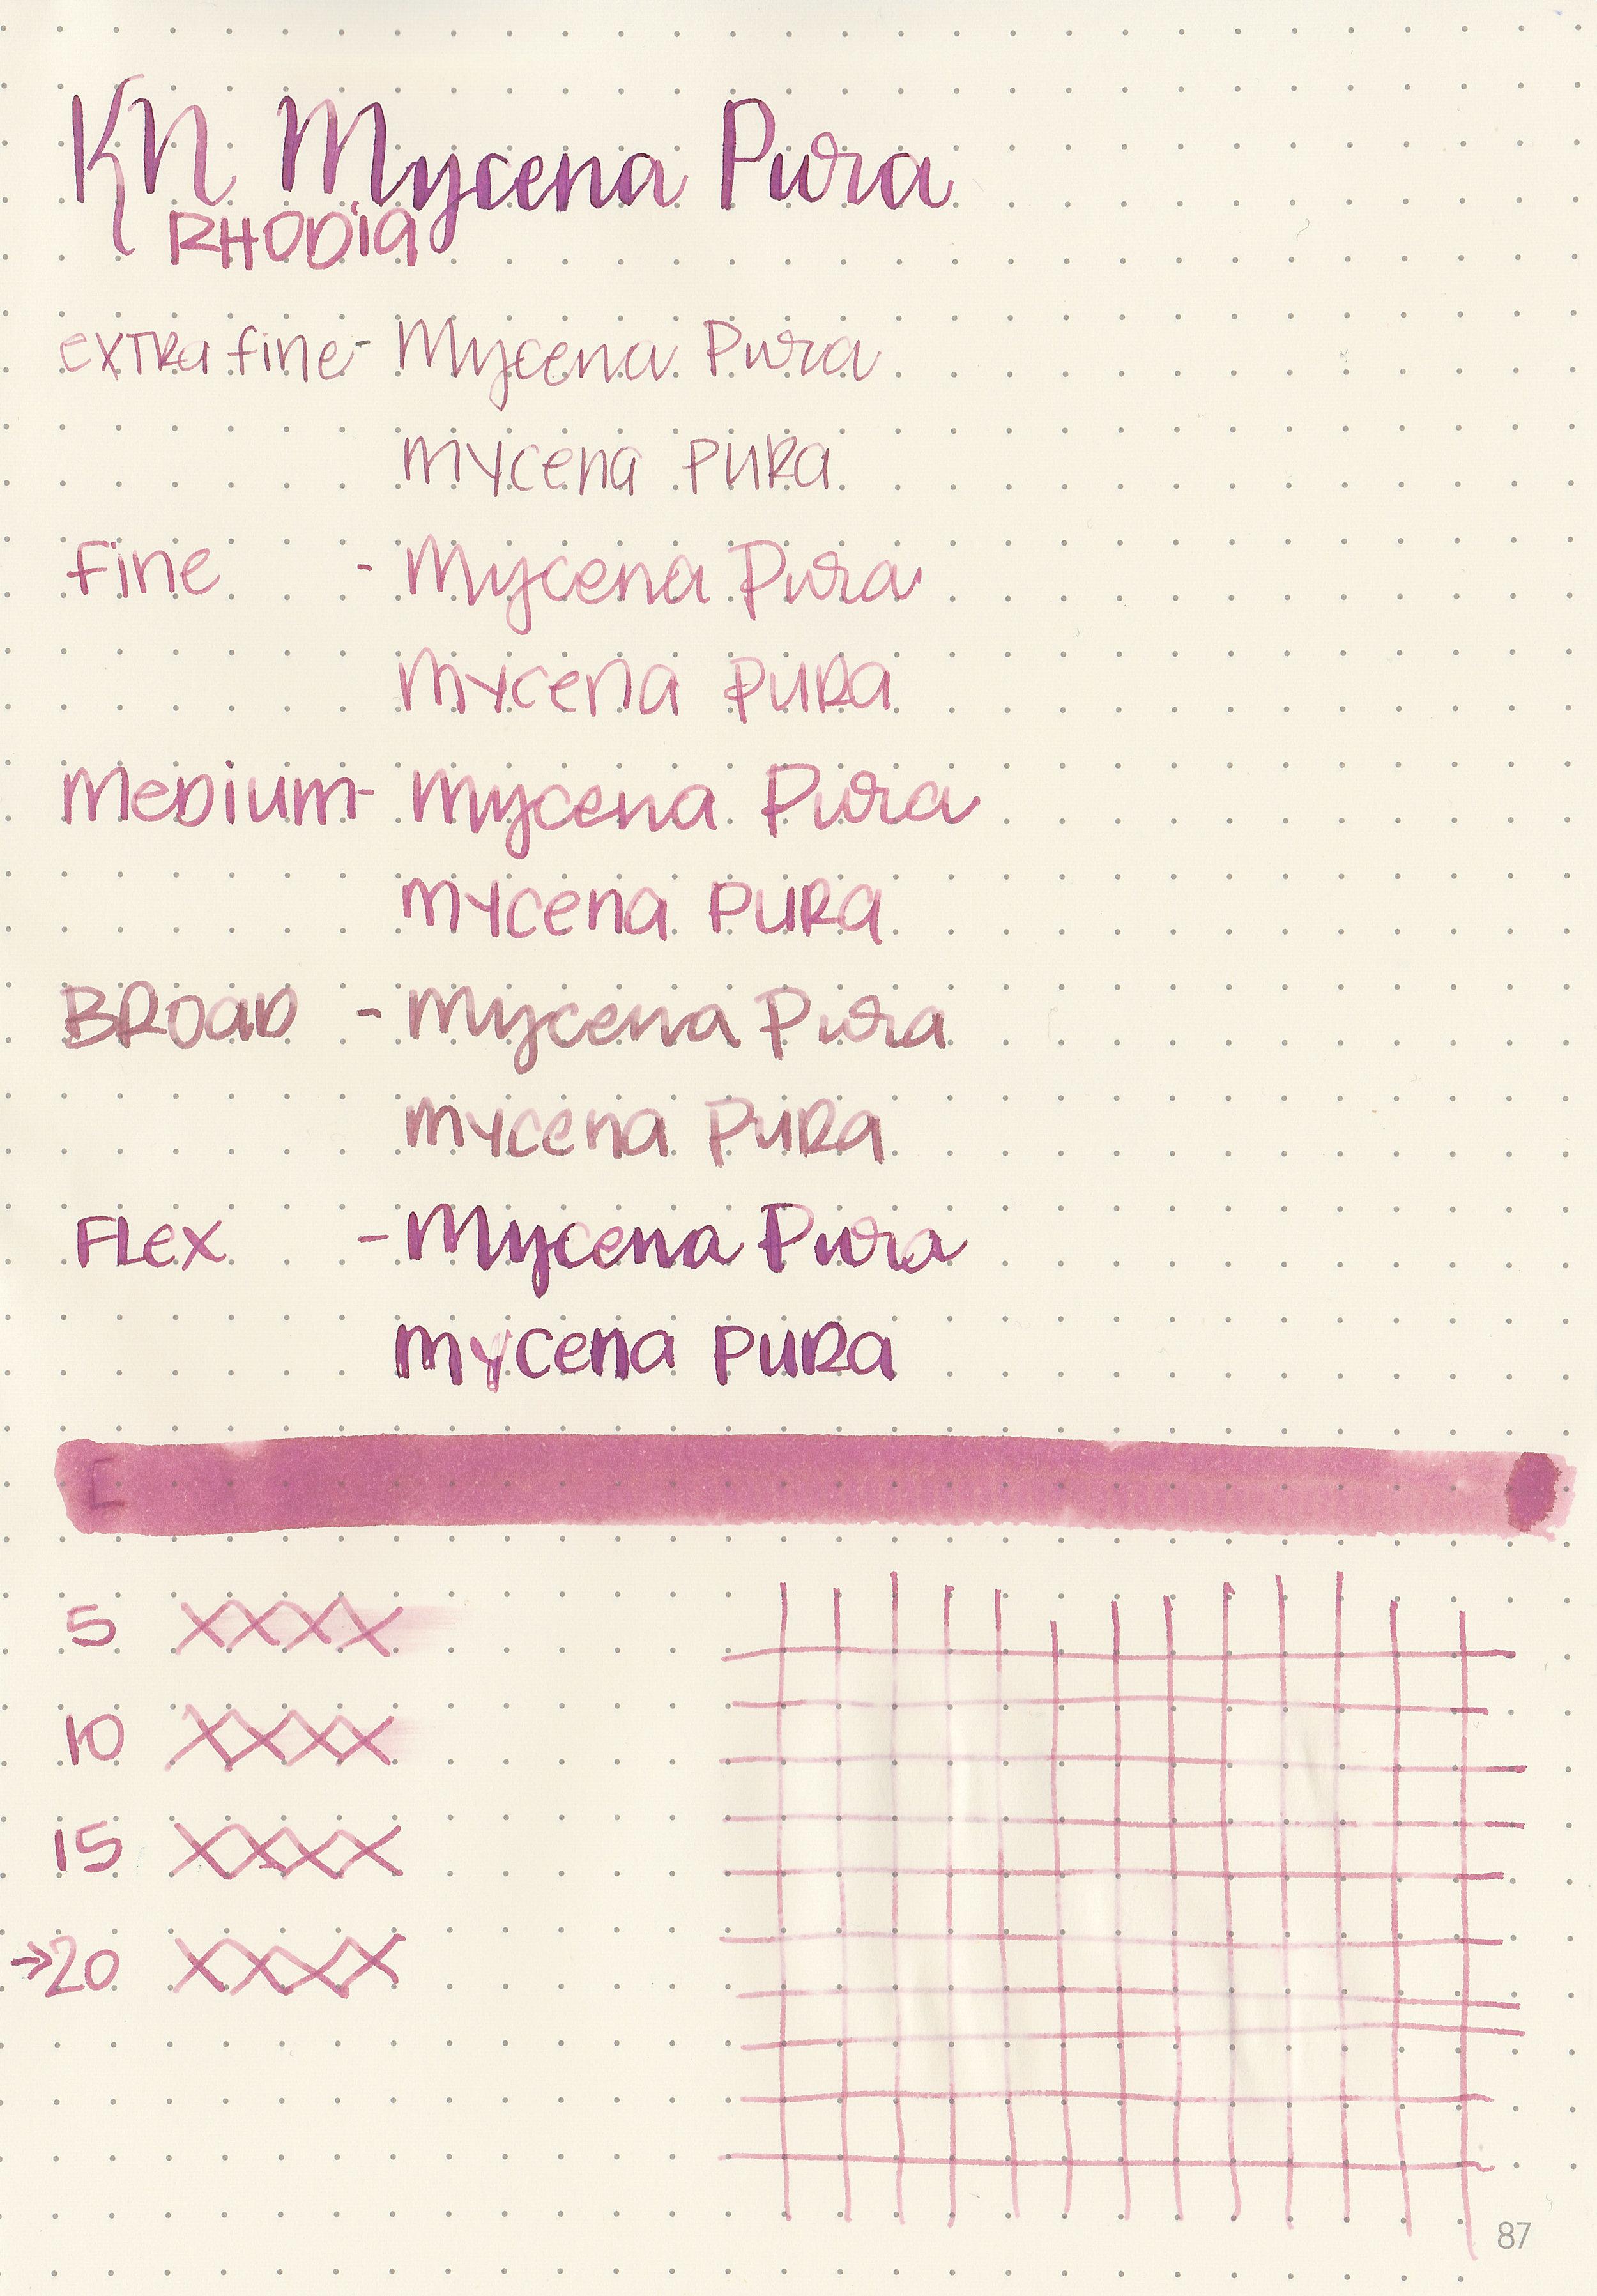 kn-mycena-pura-5.jpg